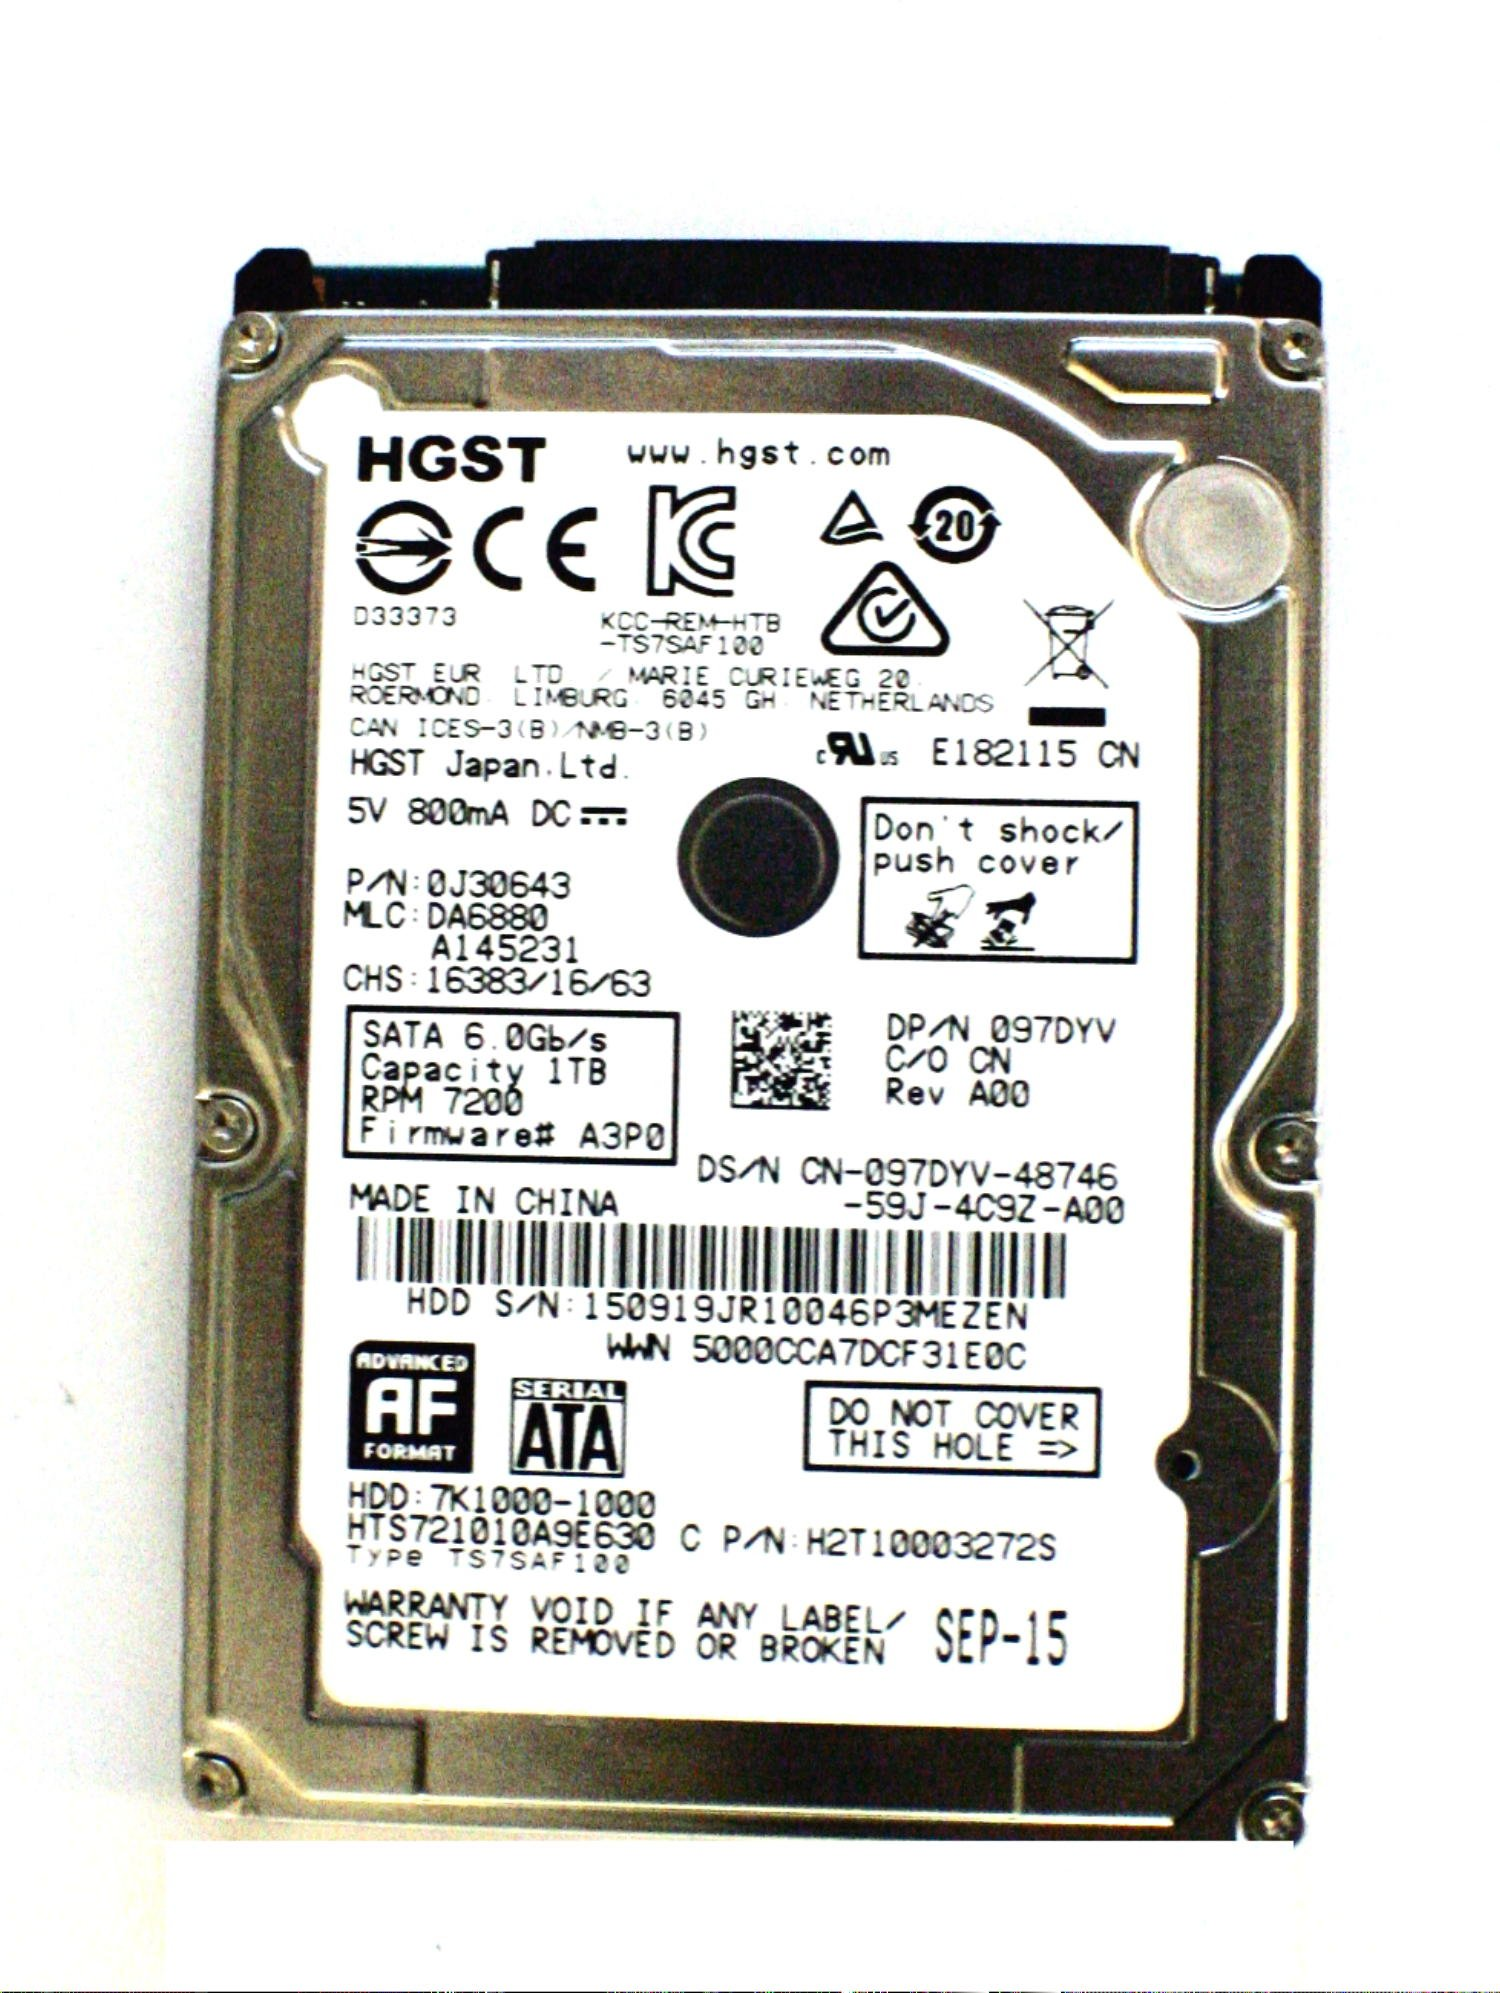 Original Dell Alienware 15 R2 17 R3 Laptop Hard Drive Hgst 97dyv 1tb 2 5 Sata 6 0gb S 7200 Rpm Walmart Com Walmart Com